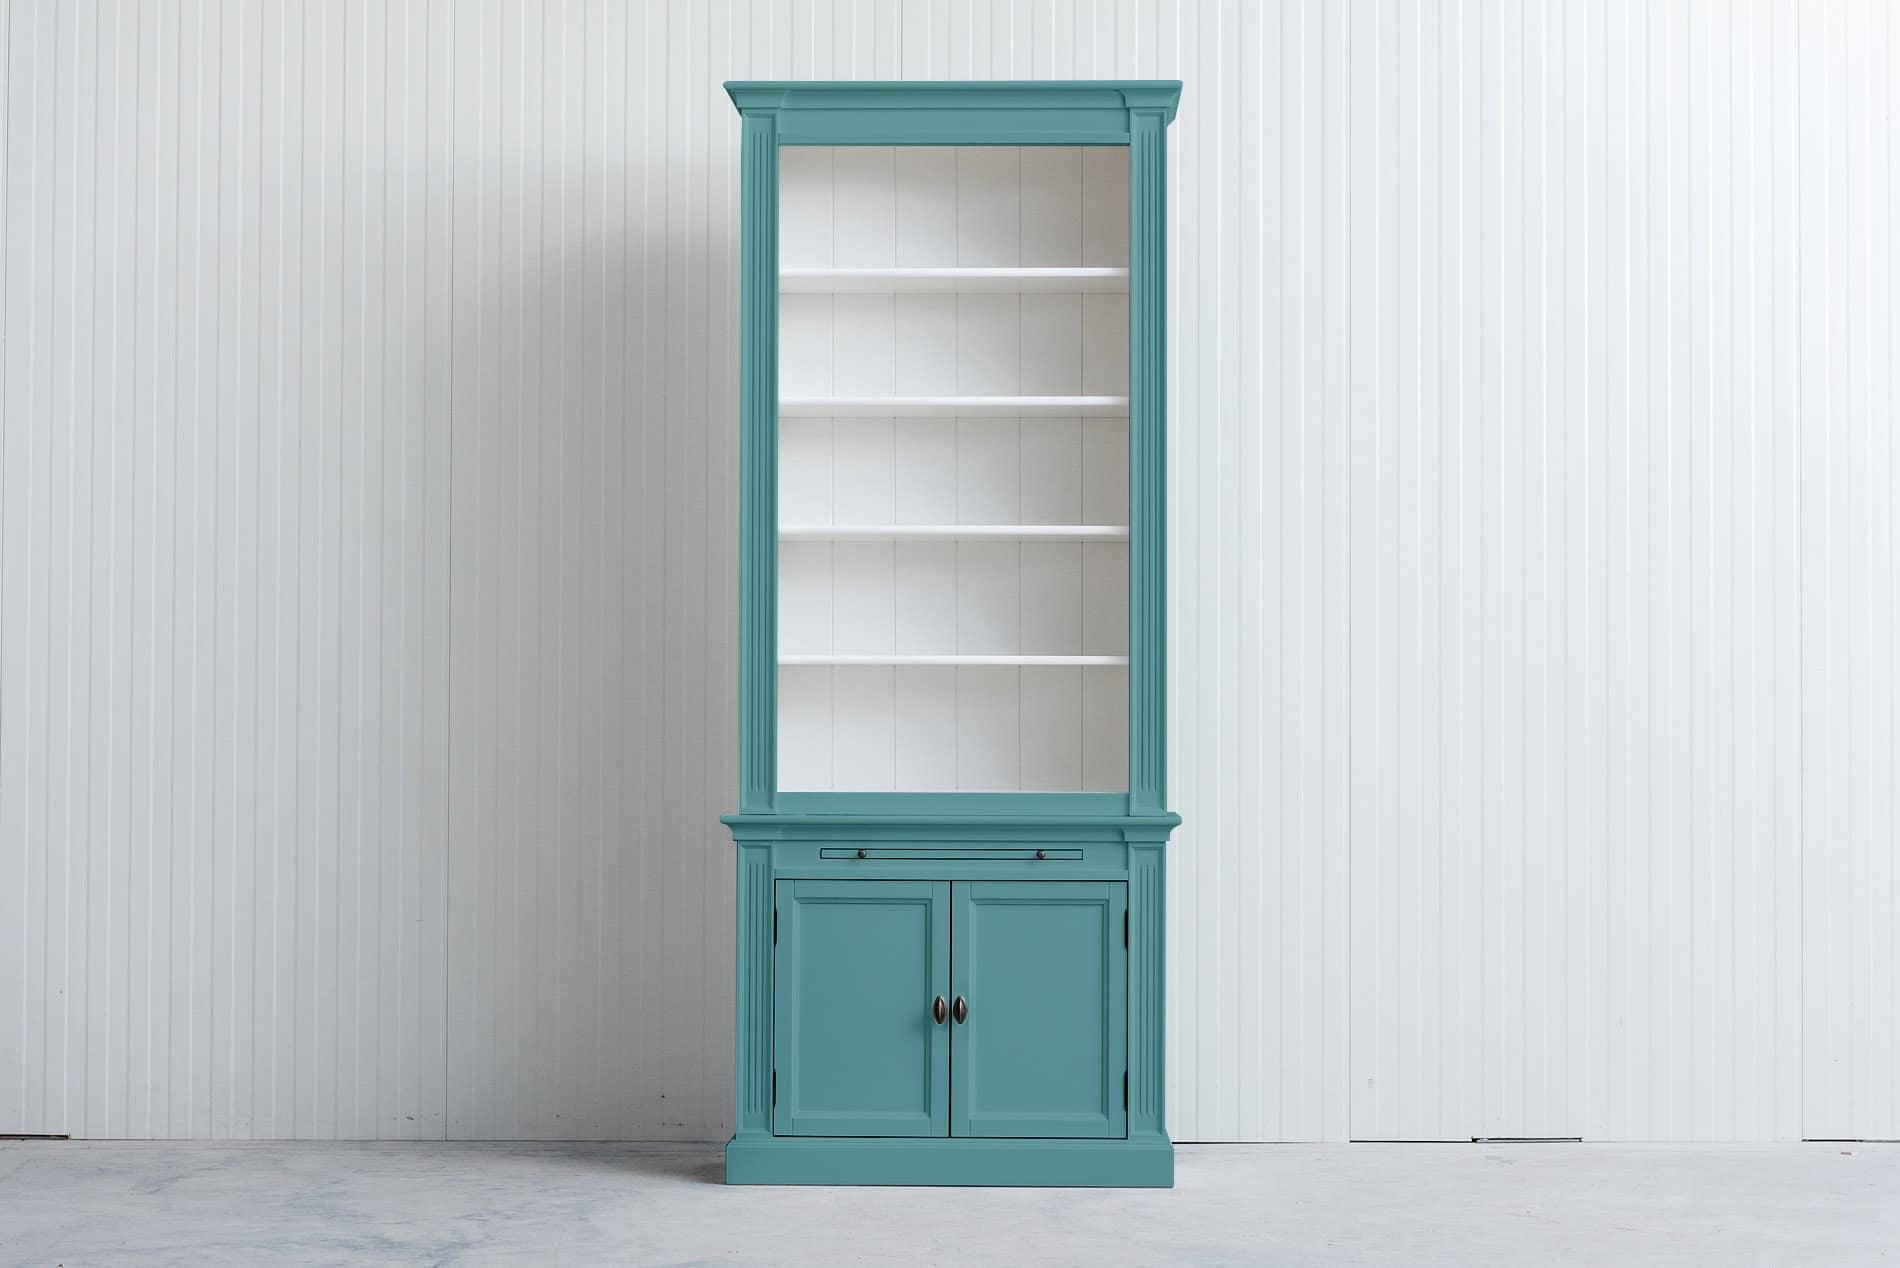 Landelijke boekenkast 1 m – Pastelturquoise – RAL6034